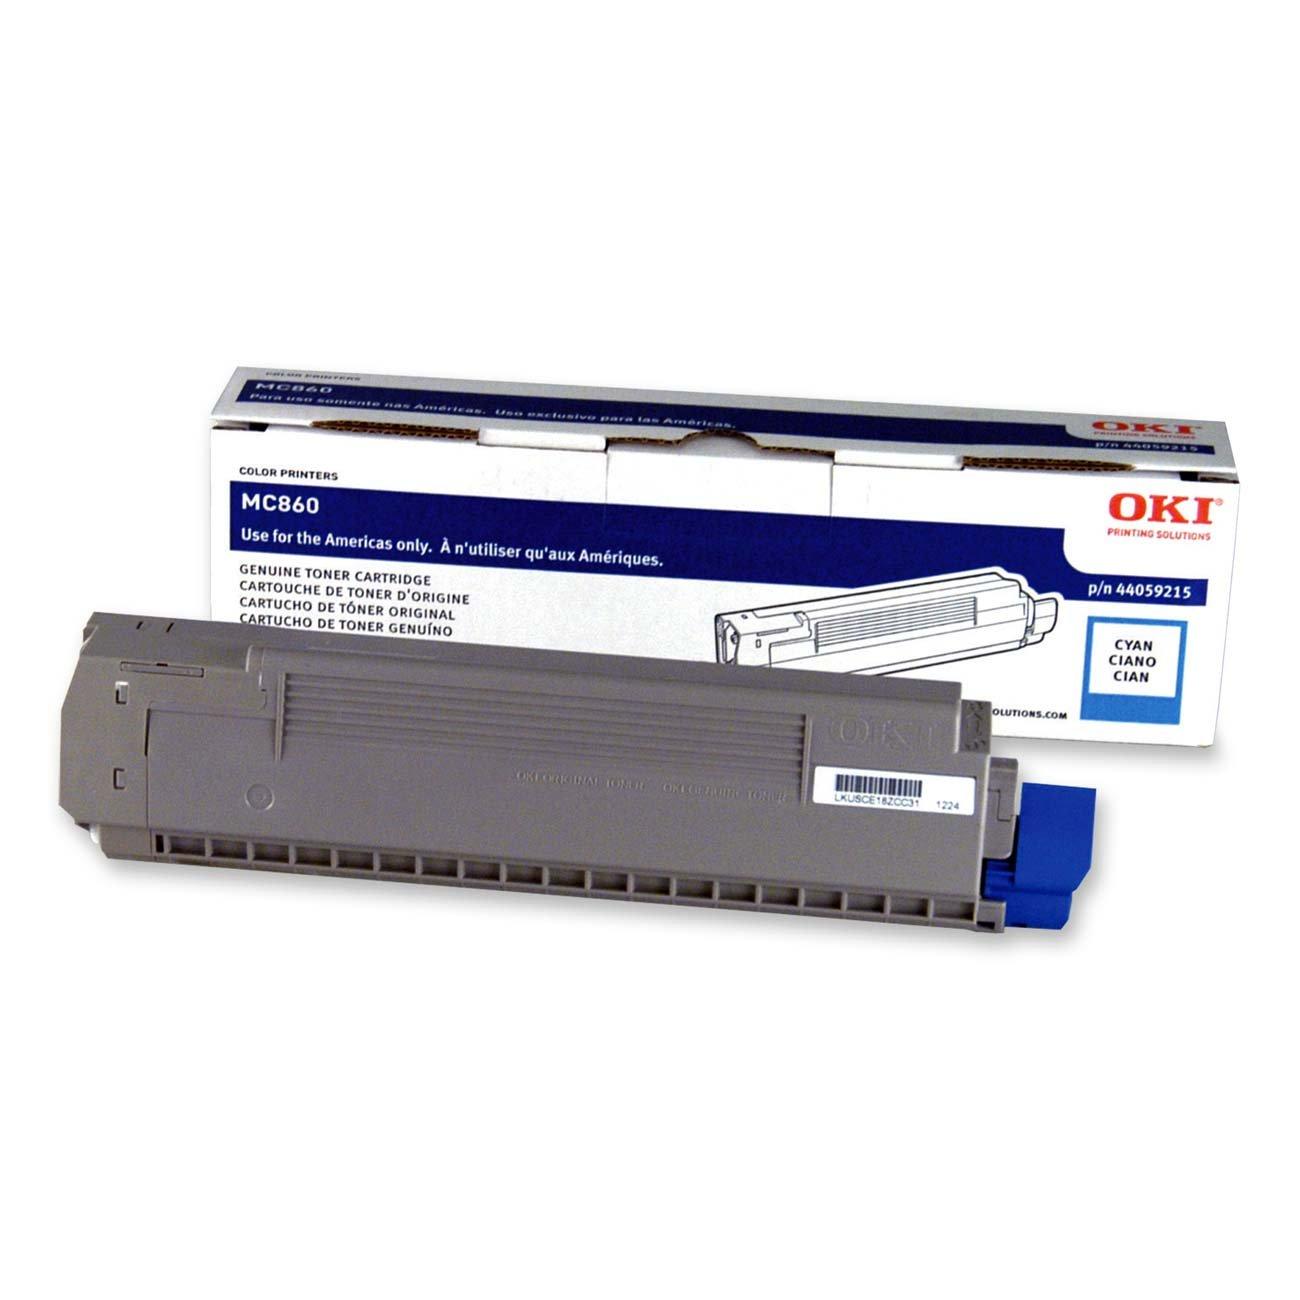 OKI - Cyan - original - toner cartridge - for OKI MC860, MC860cdtn, MC860cdxn, MC860dn B001QFYCRK